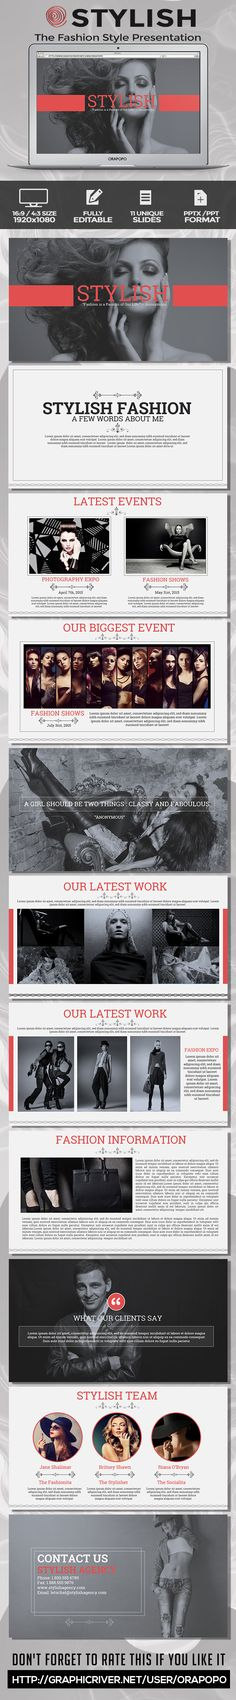 Stylish The Fashion Style Presentation #design #slides Download: http://graphicriver.net/item/stylish-the-fashion-style-presentation/11220893?ref=ksioks